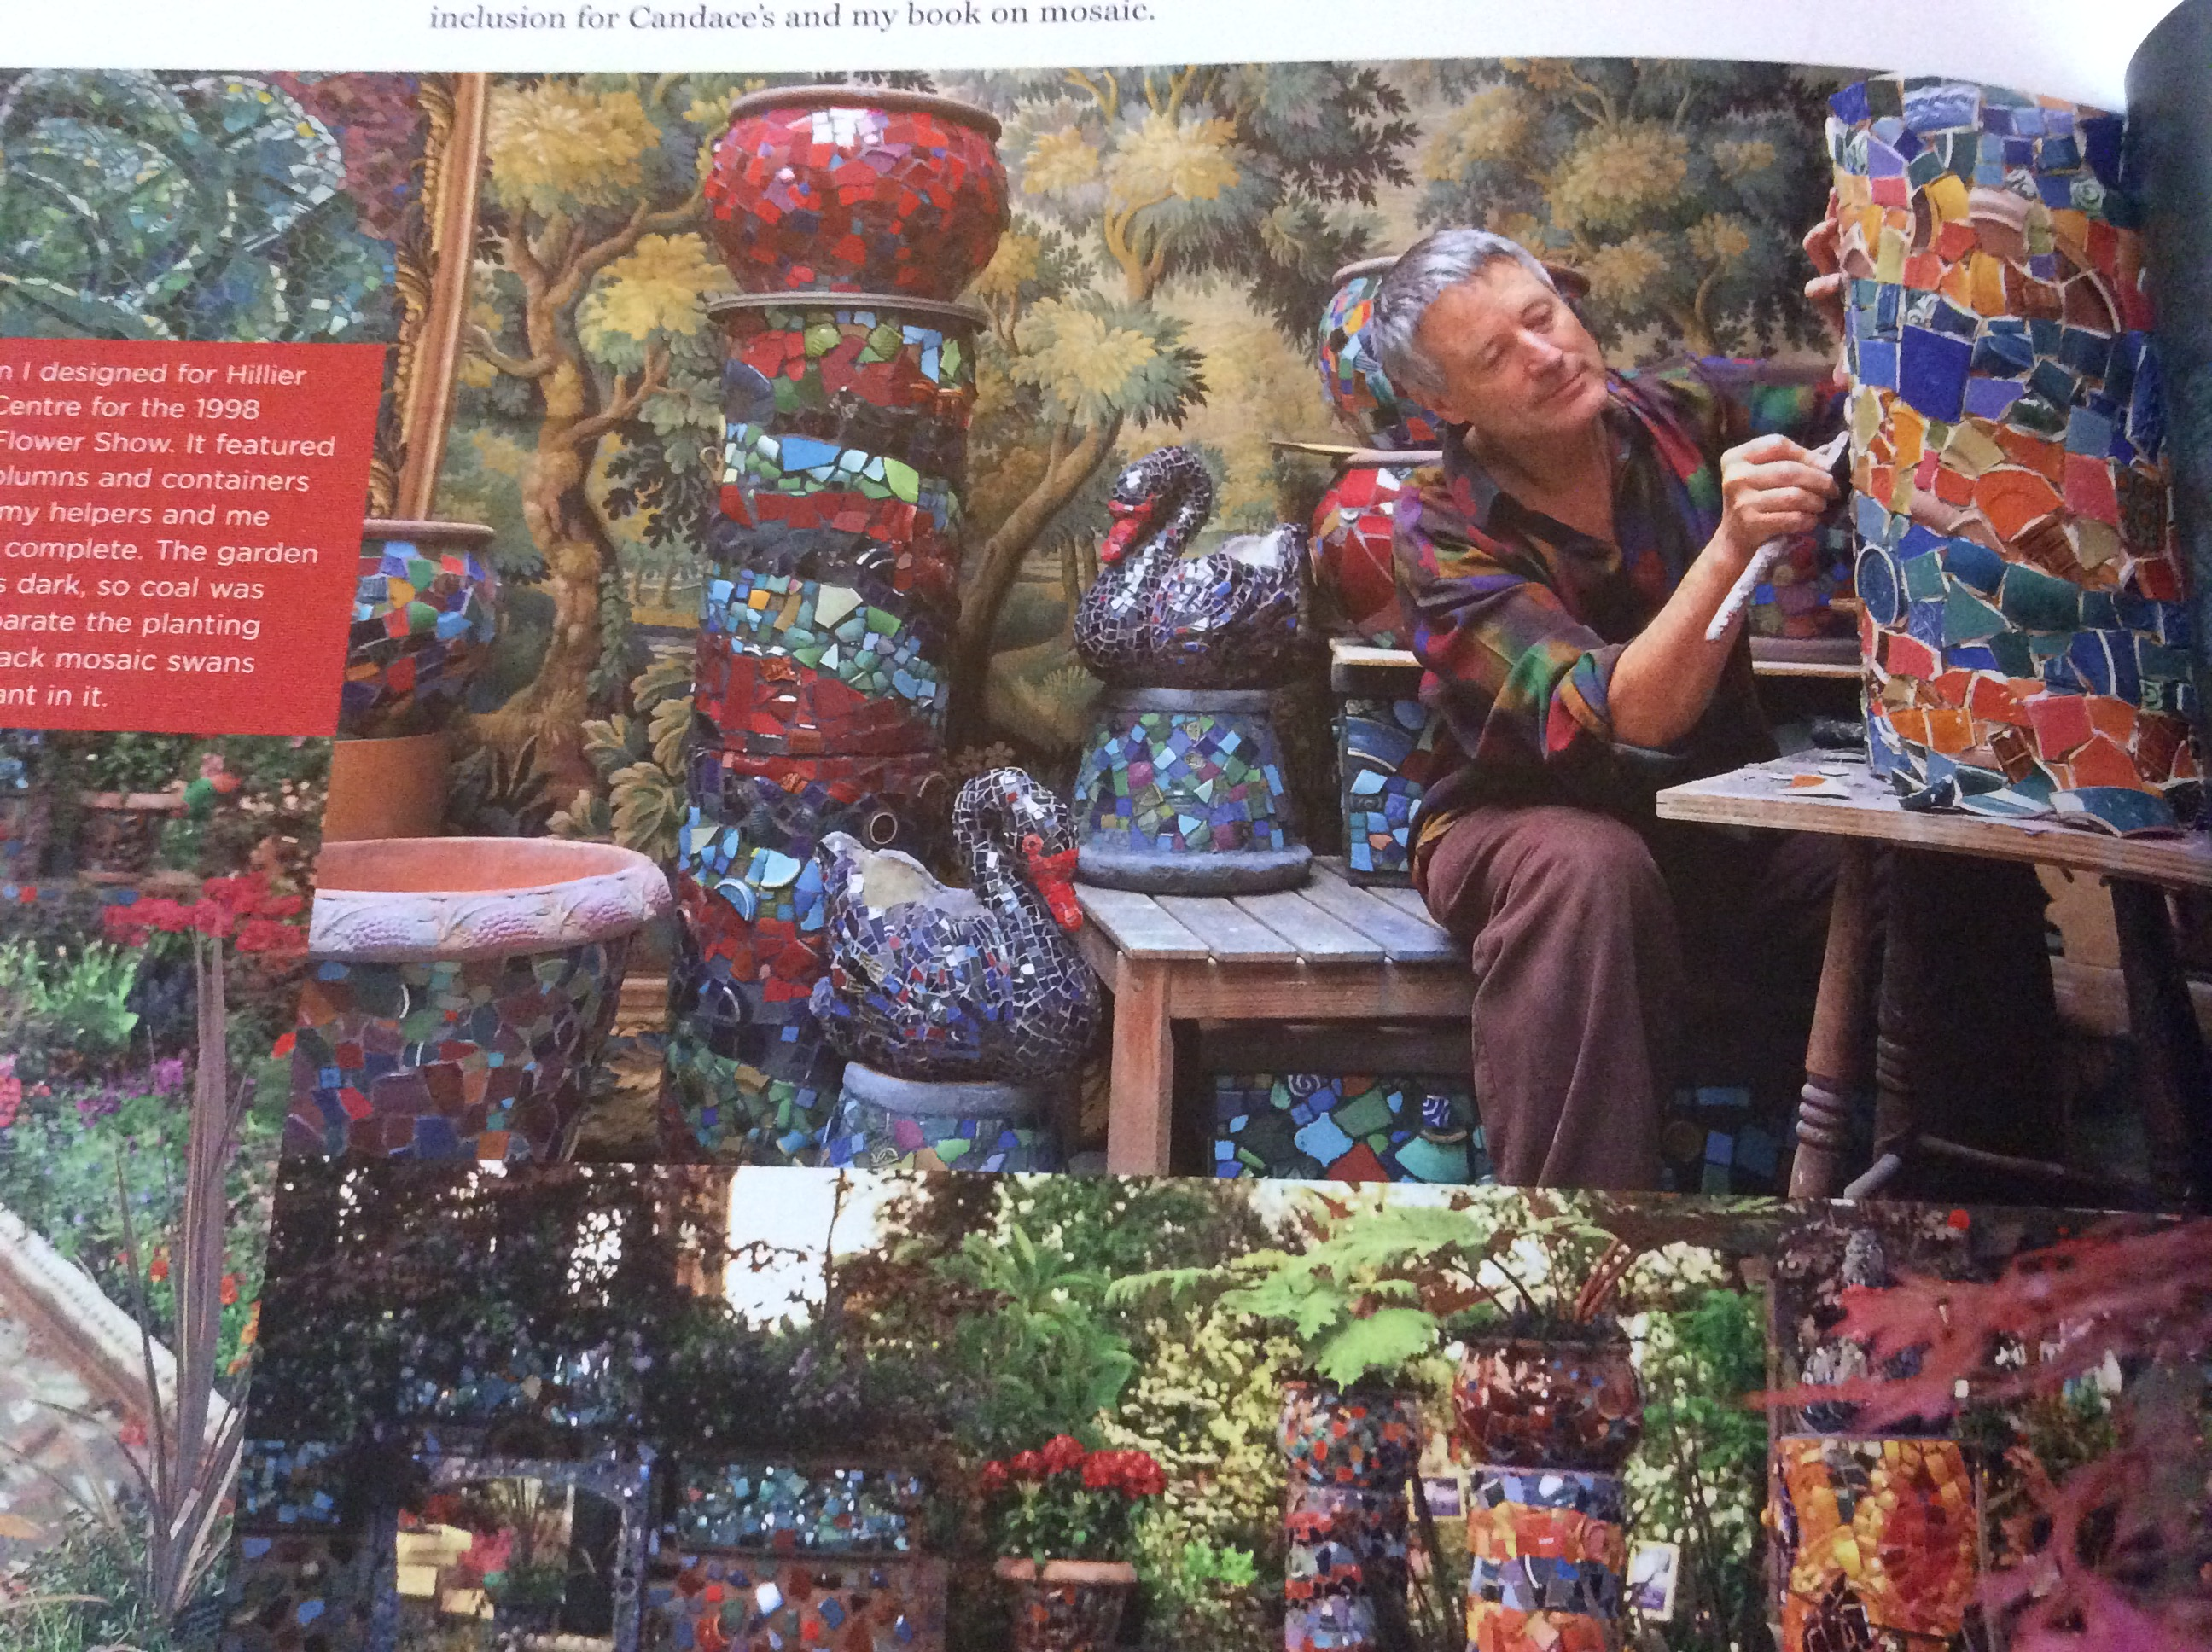 Kaffe Fassett working on mosaics